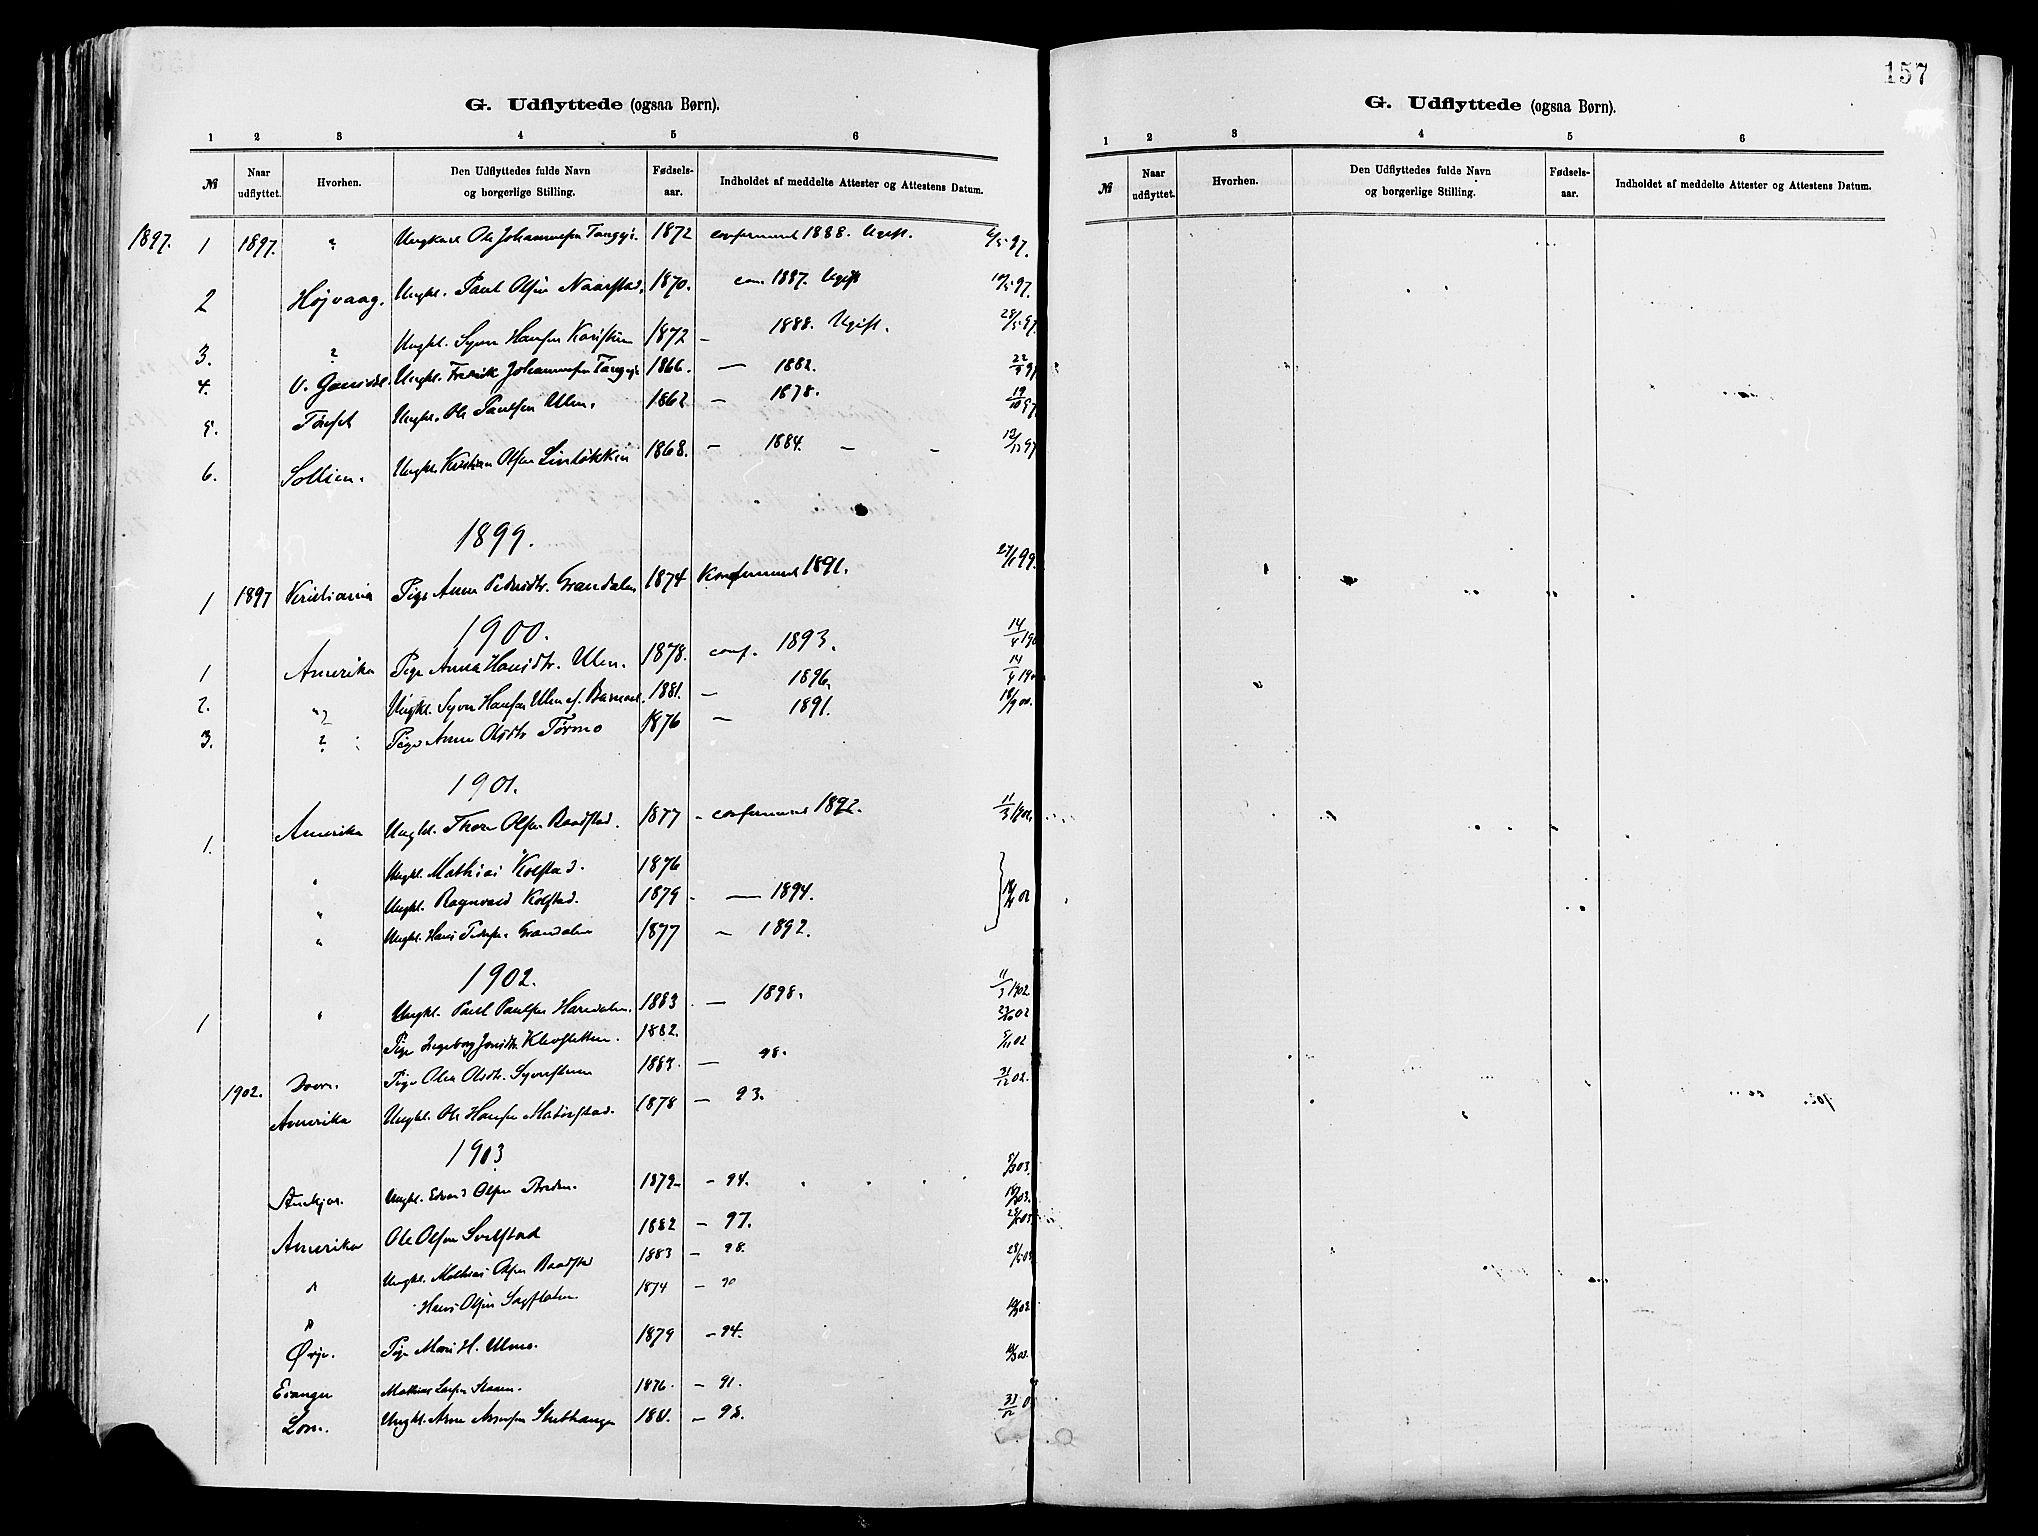 SAH, Vågå prestekontor, Ministerialbok nr. 8, 1886-1904, s. 157